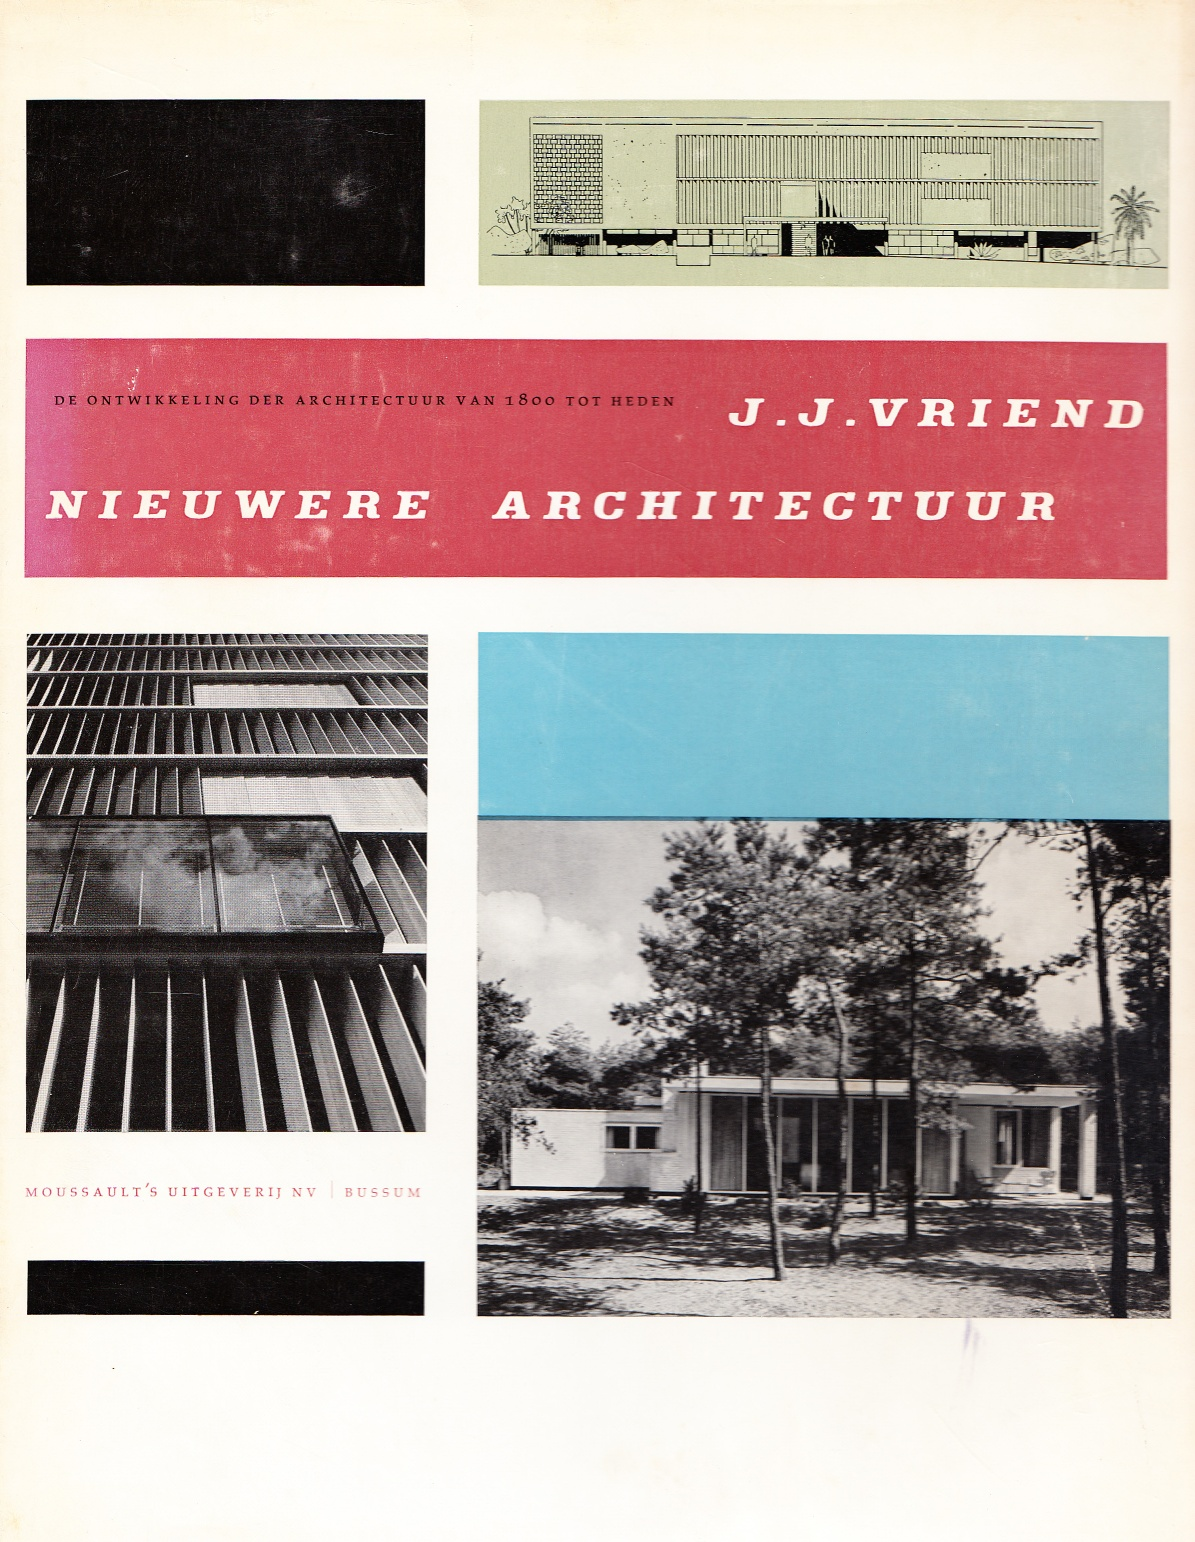 vriend-j-j-nieuwere-architectuur-1957